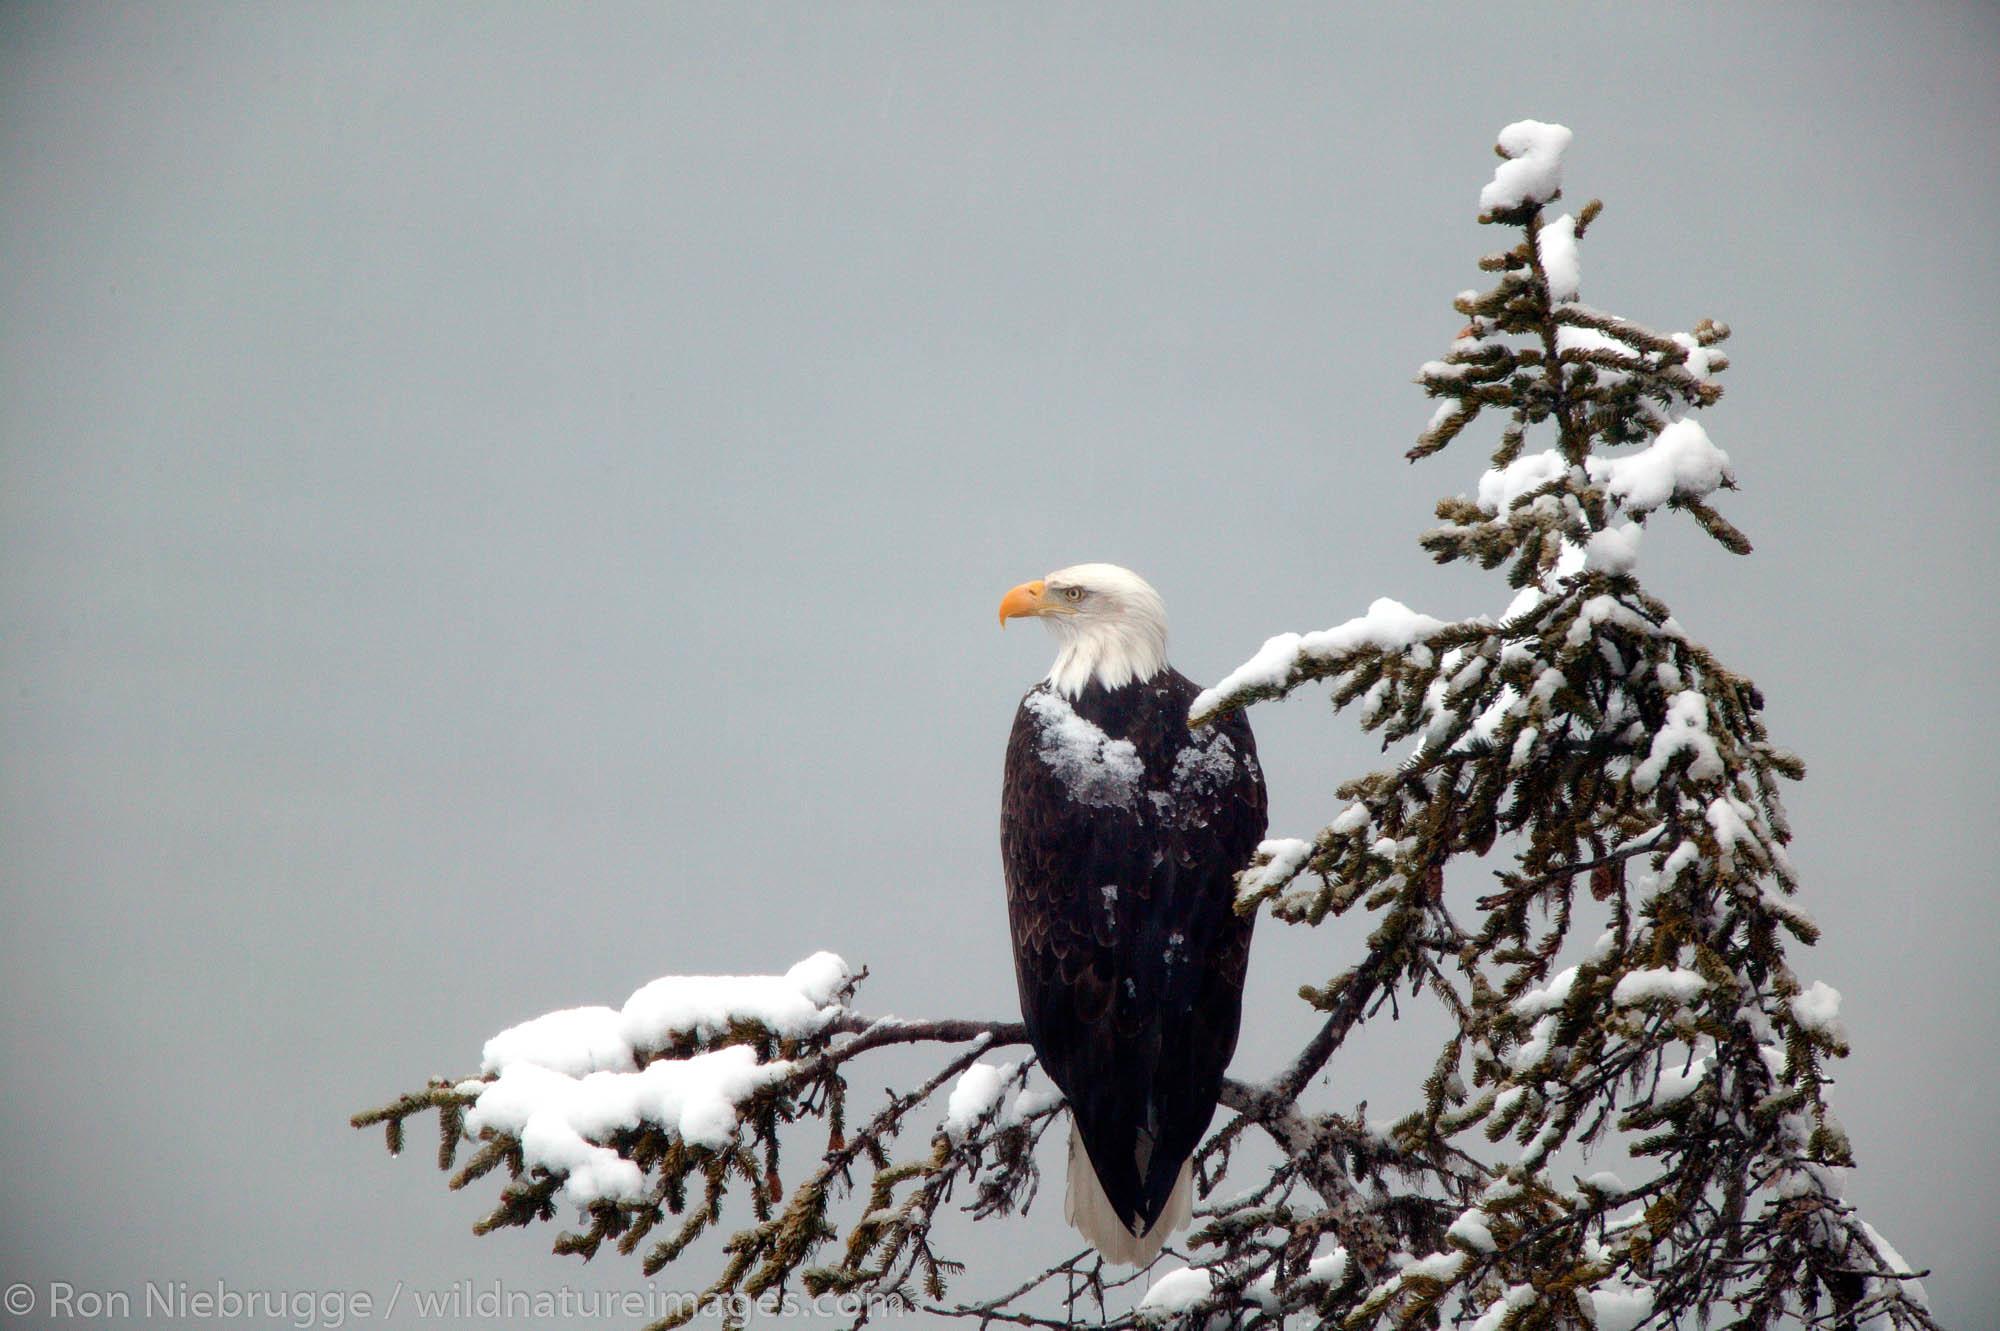 Snow falls on Bald Eagle (Haliaeetus leucocephalus), Ressurection Bay in the background.  Seward, Alaska.